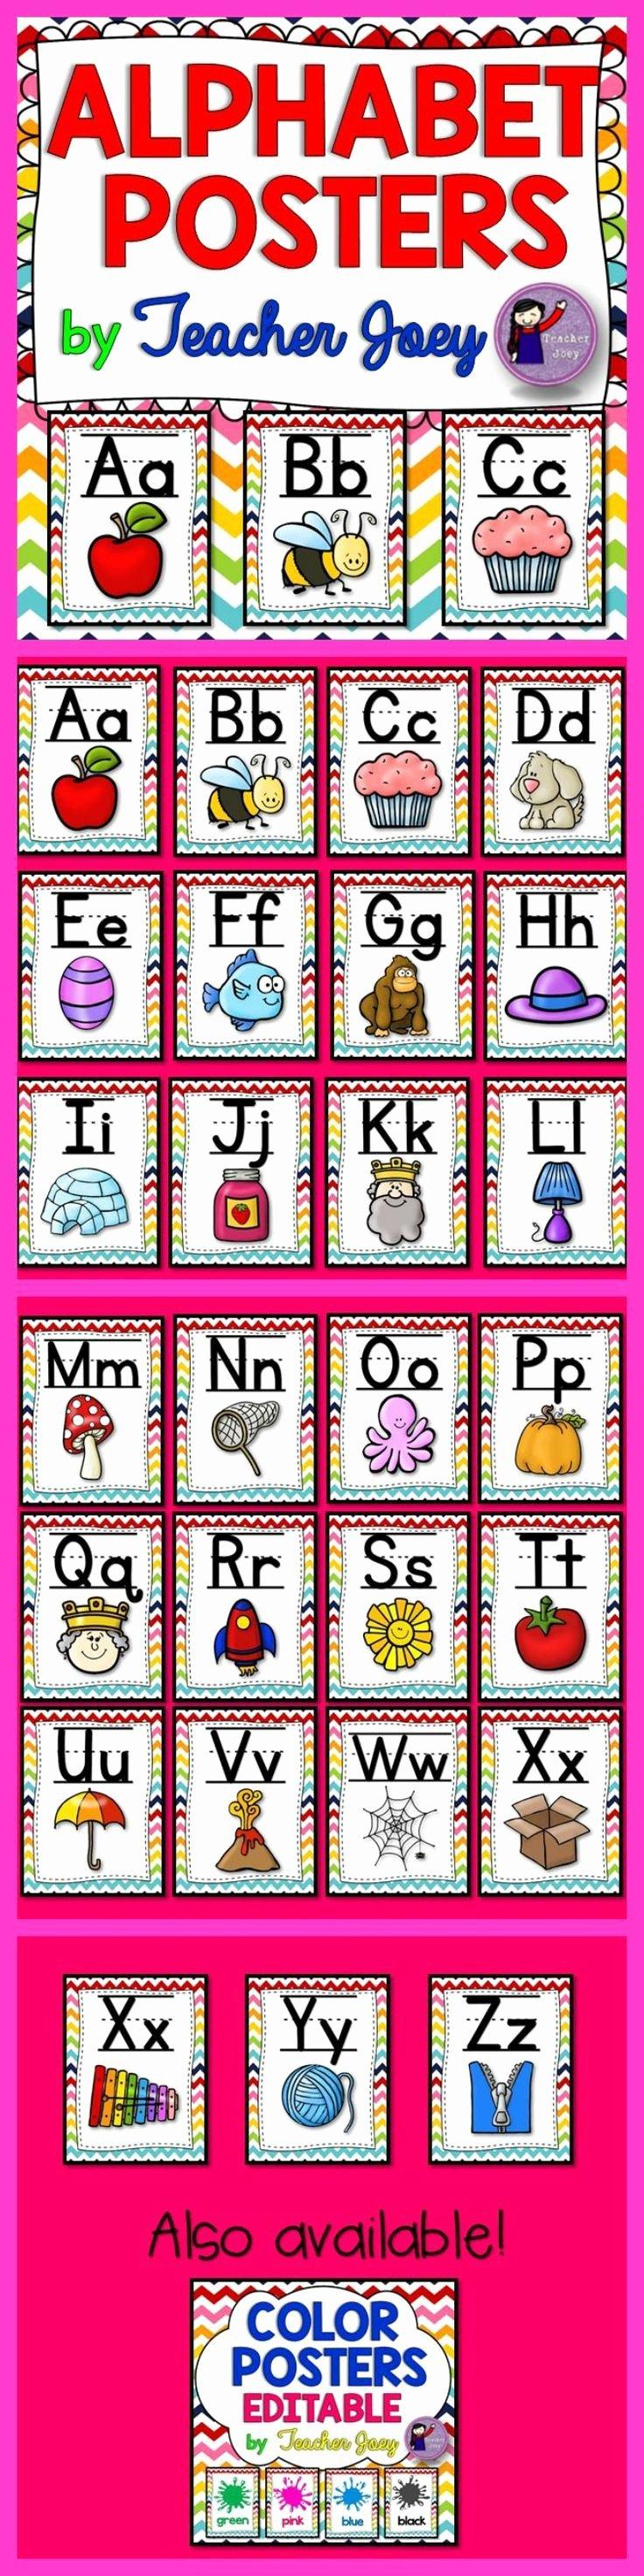 Alphabet Poster for Classroom Lovely 1000 Ideas About Chevron Alphabet On Pinterest